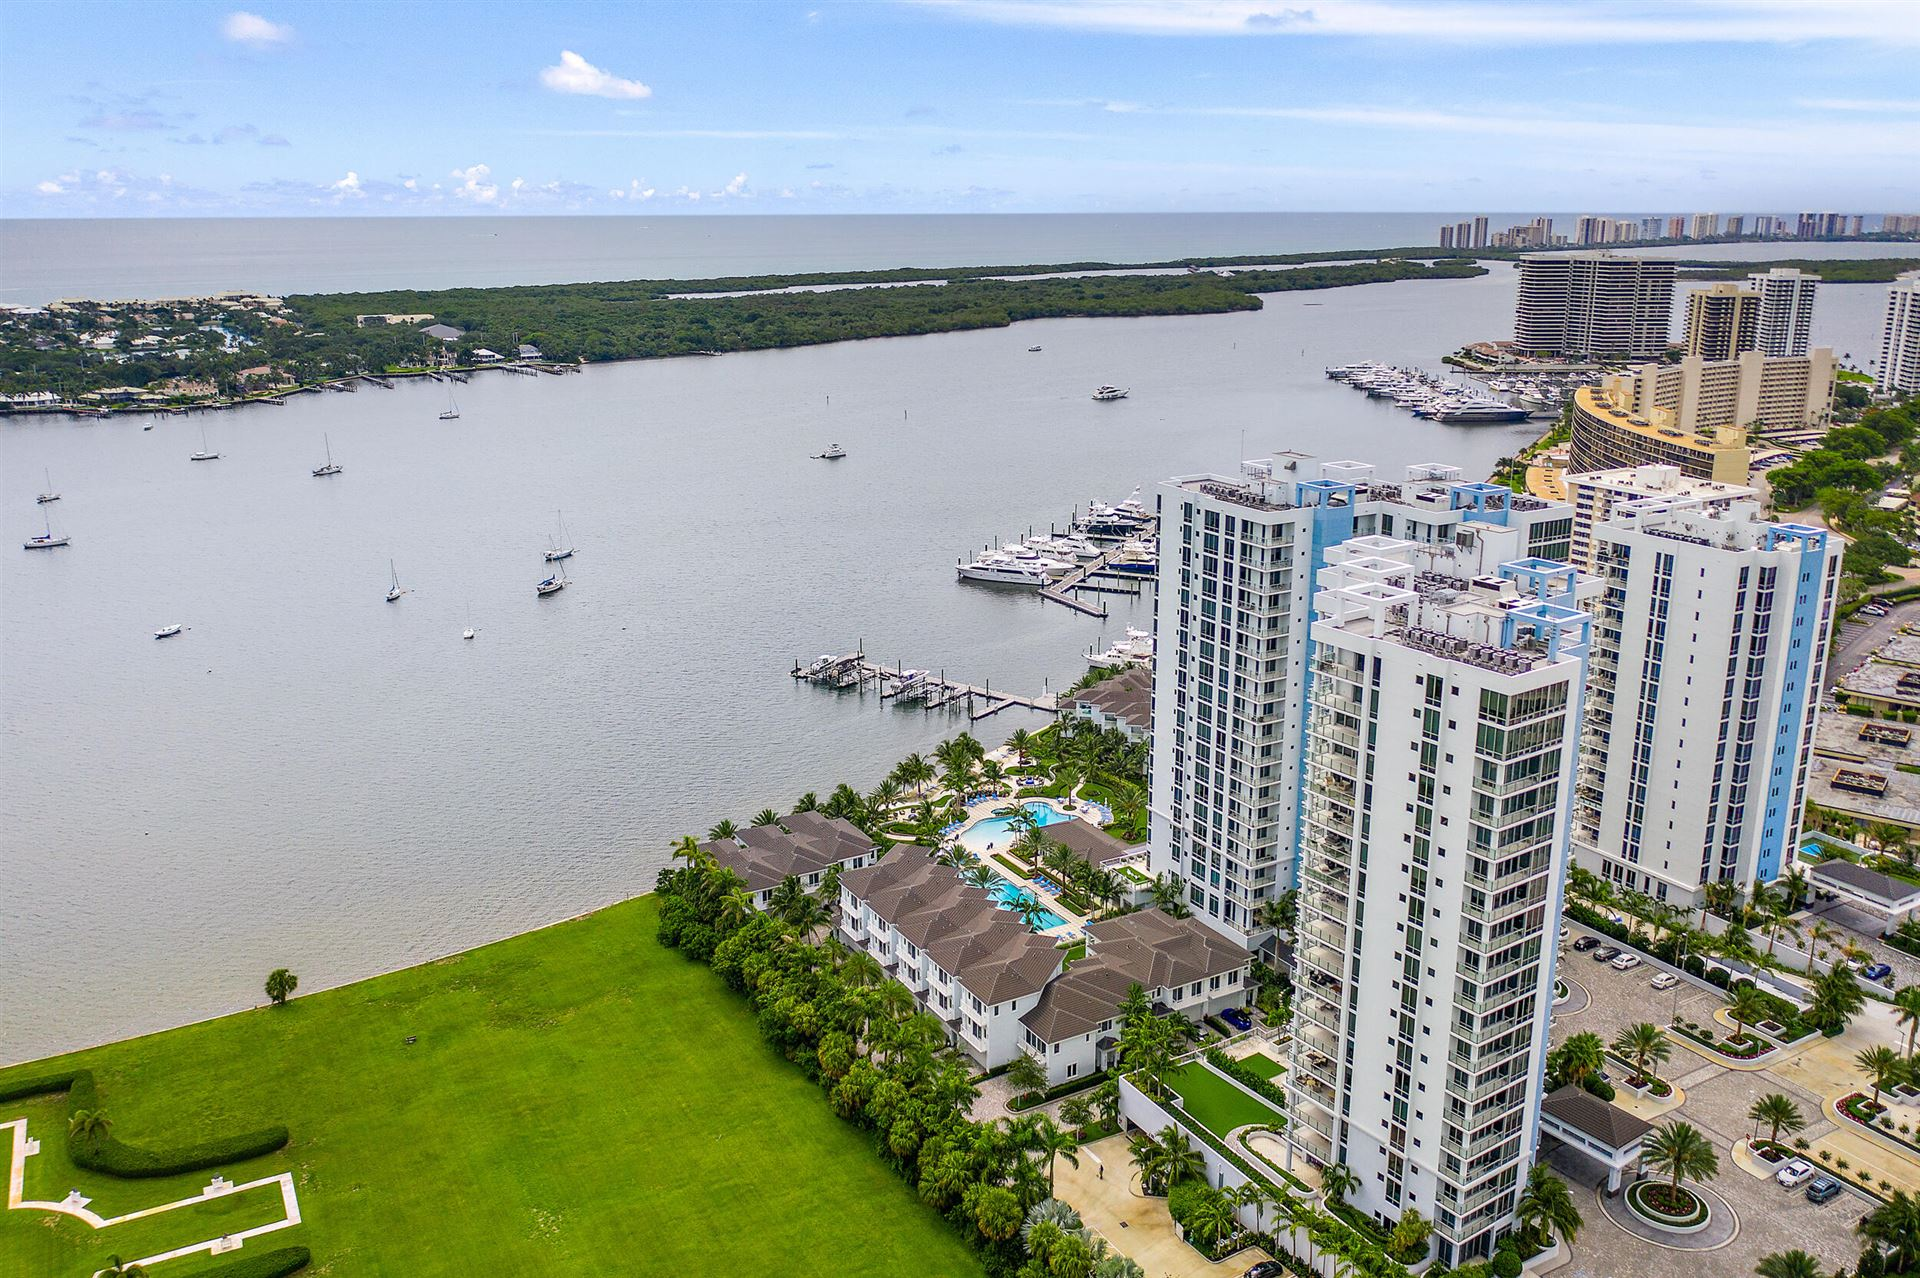 Photo of 1 Water Club Way #1002-N, North Palm Beach, FL 33408 (MLS # RX-10726412)